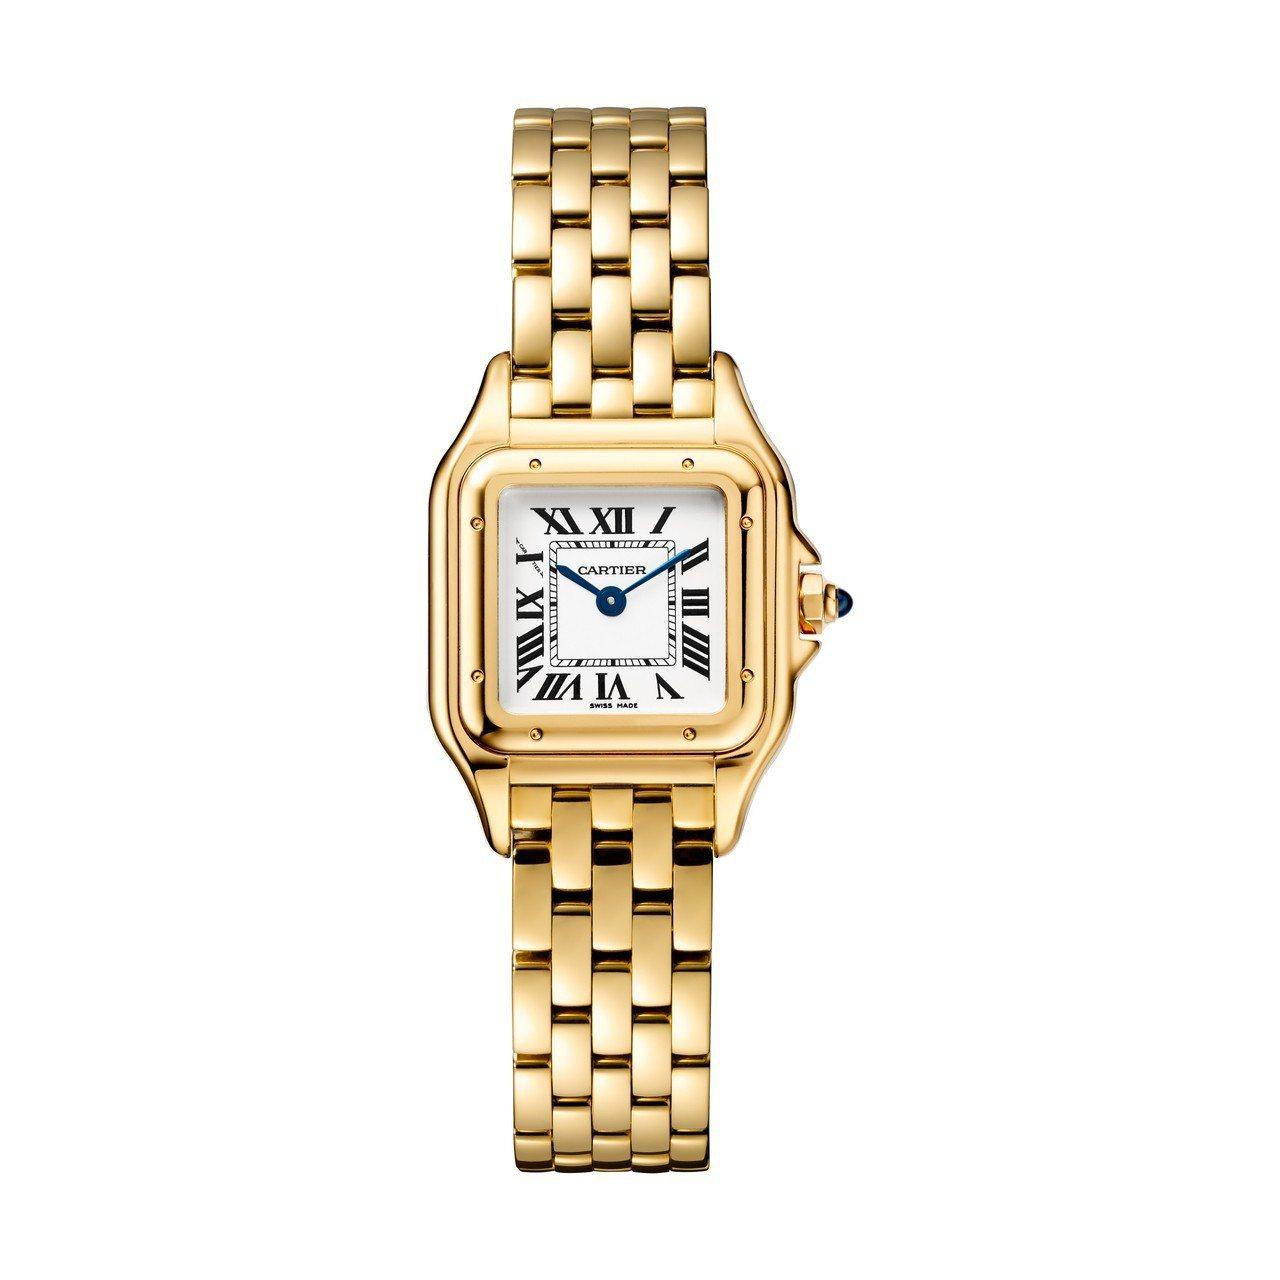 Panthère de Cartier美洲豹黃K金腕表,小型款,黃K金表殼、錶鍊...